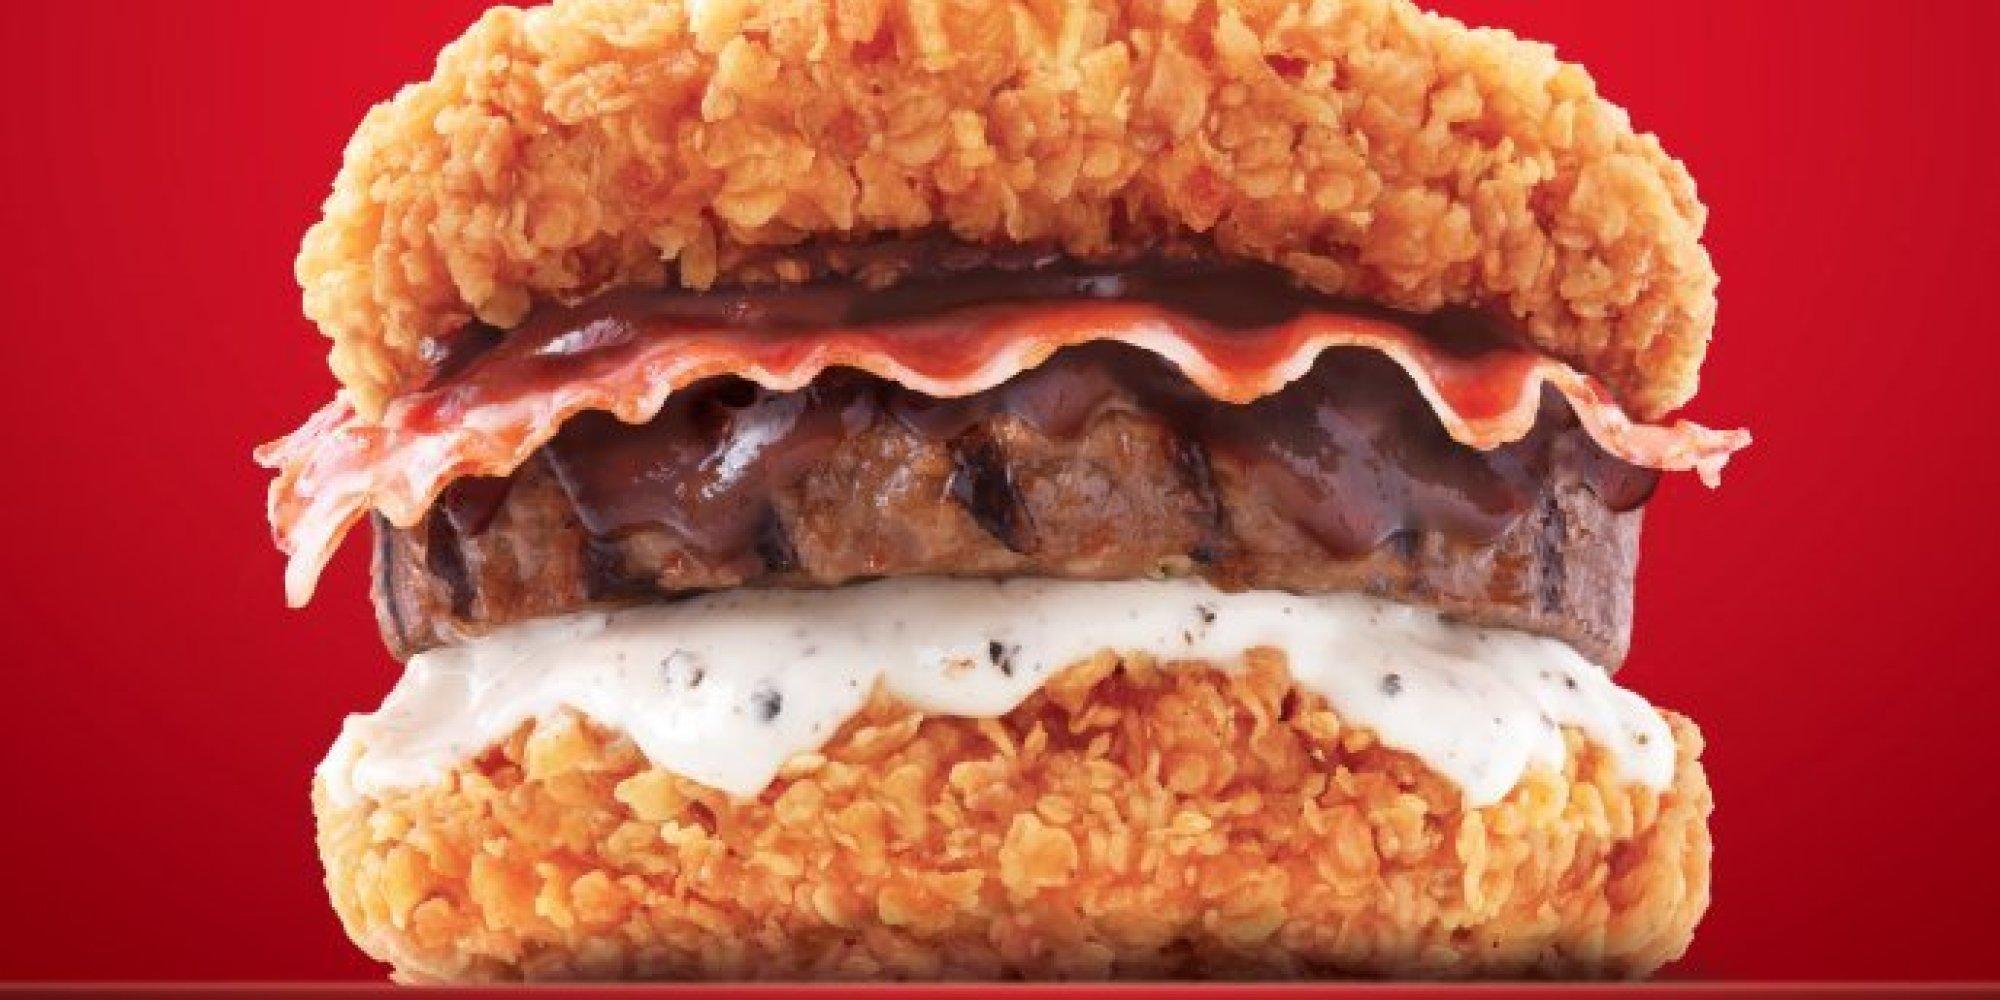 Favori KFC's New 'Zinger Double Down King' Is An Even Bigger Monstrosity  IU84